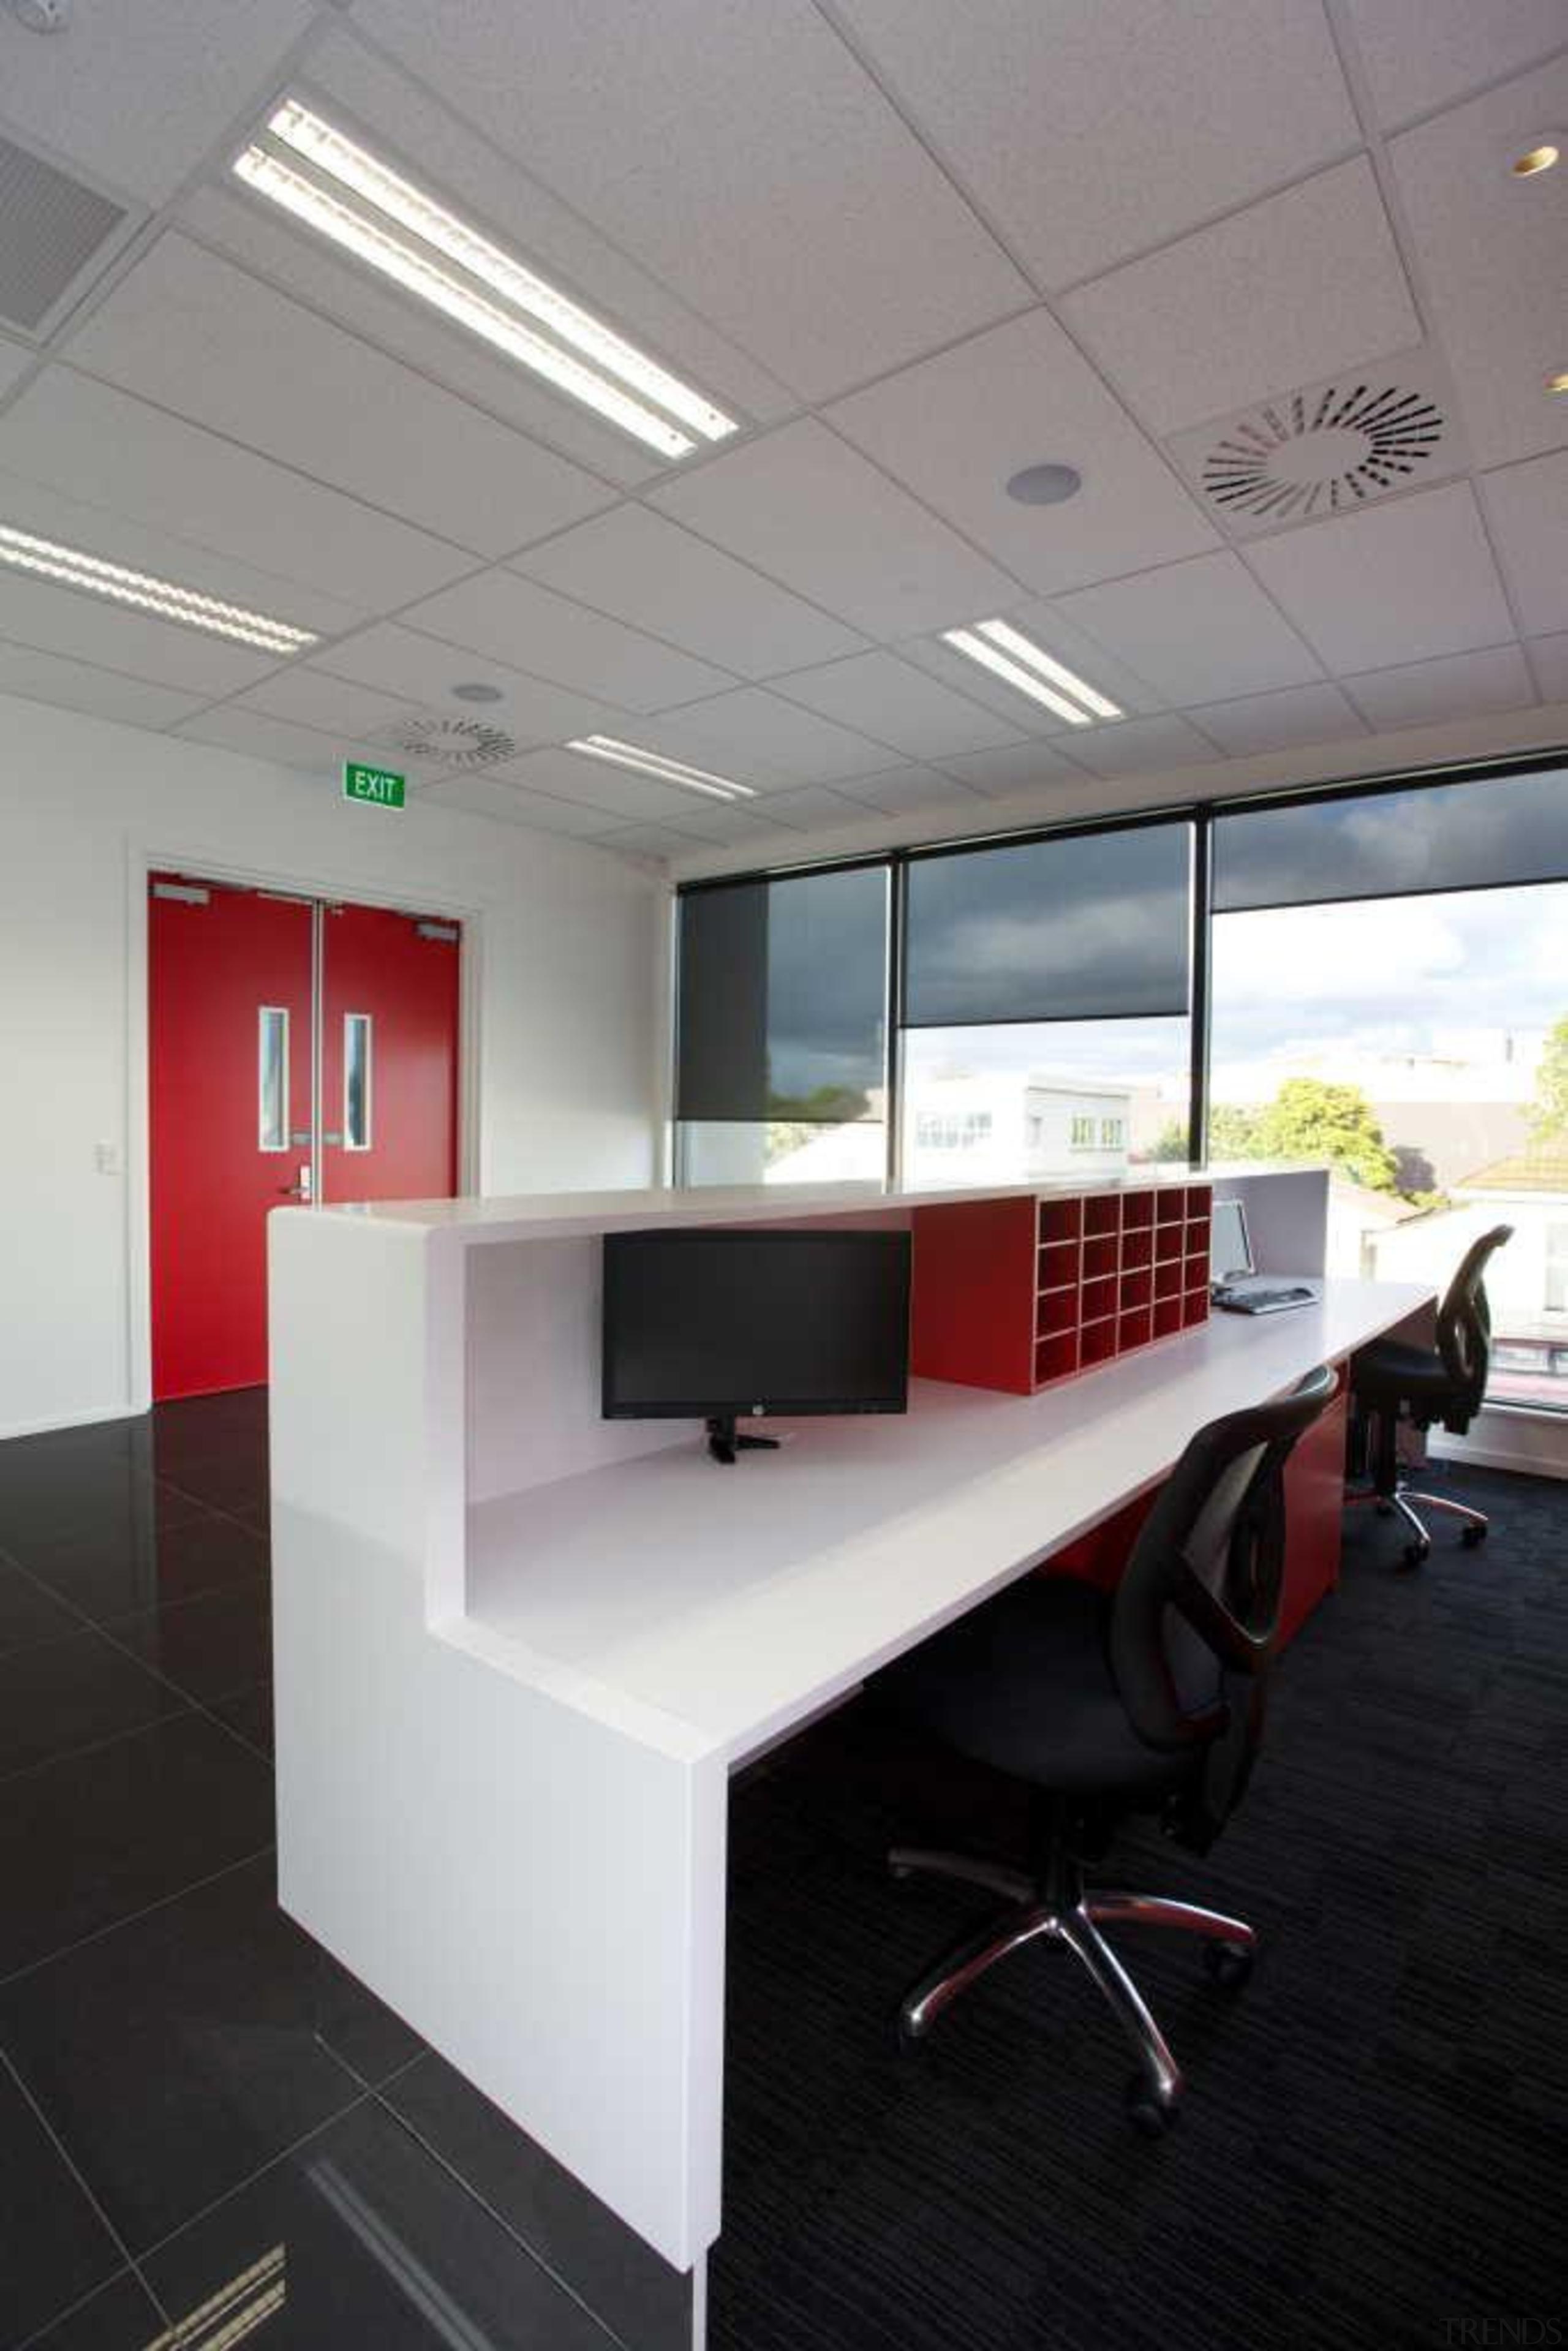 mg45760145207.jpg - mg45760145207.jpg - architecture | ceiling | architecture, ceiling, desk, floor, furniture, interior design, office, product design, gray, black